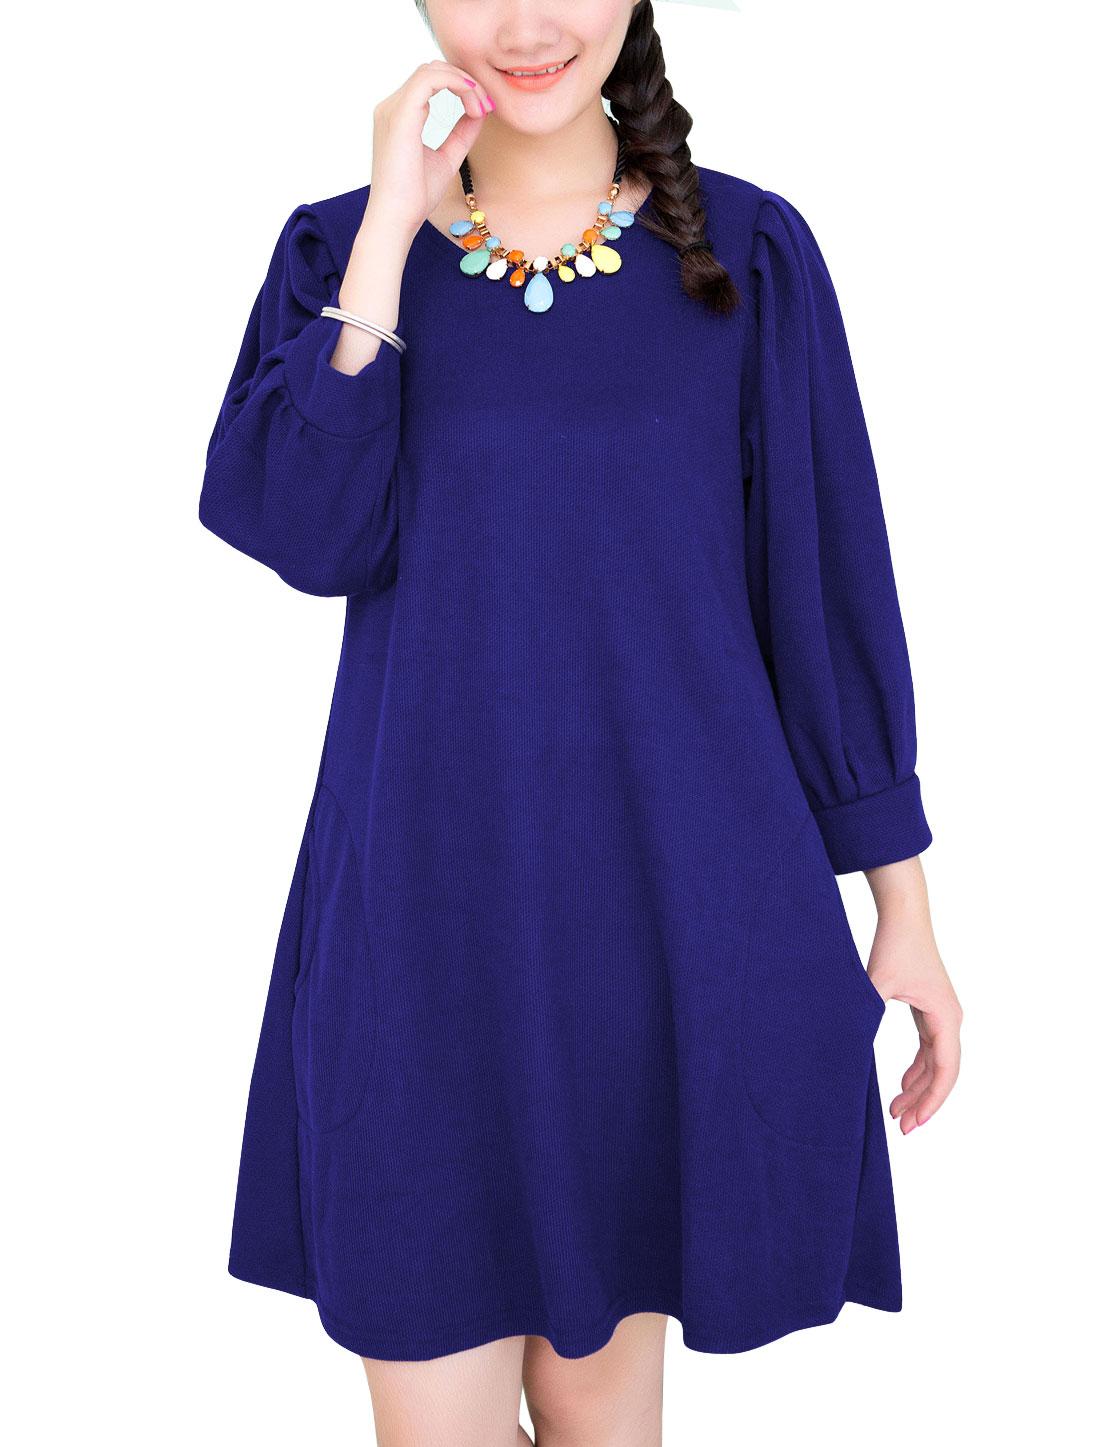 Maternity 3/4 Lantern Sleeves Double Side Pockets Dress Dark Blue M